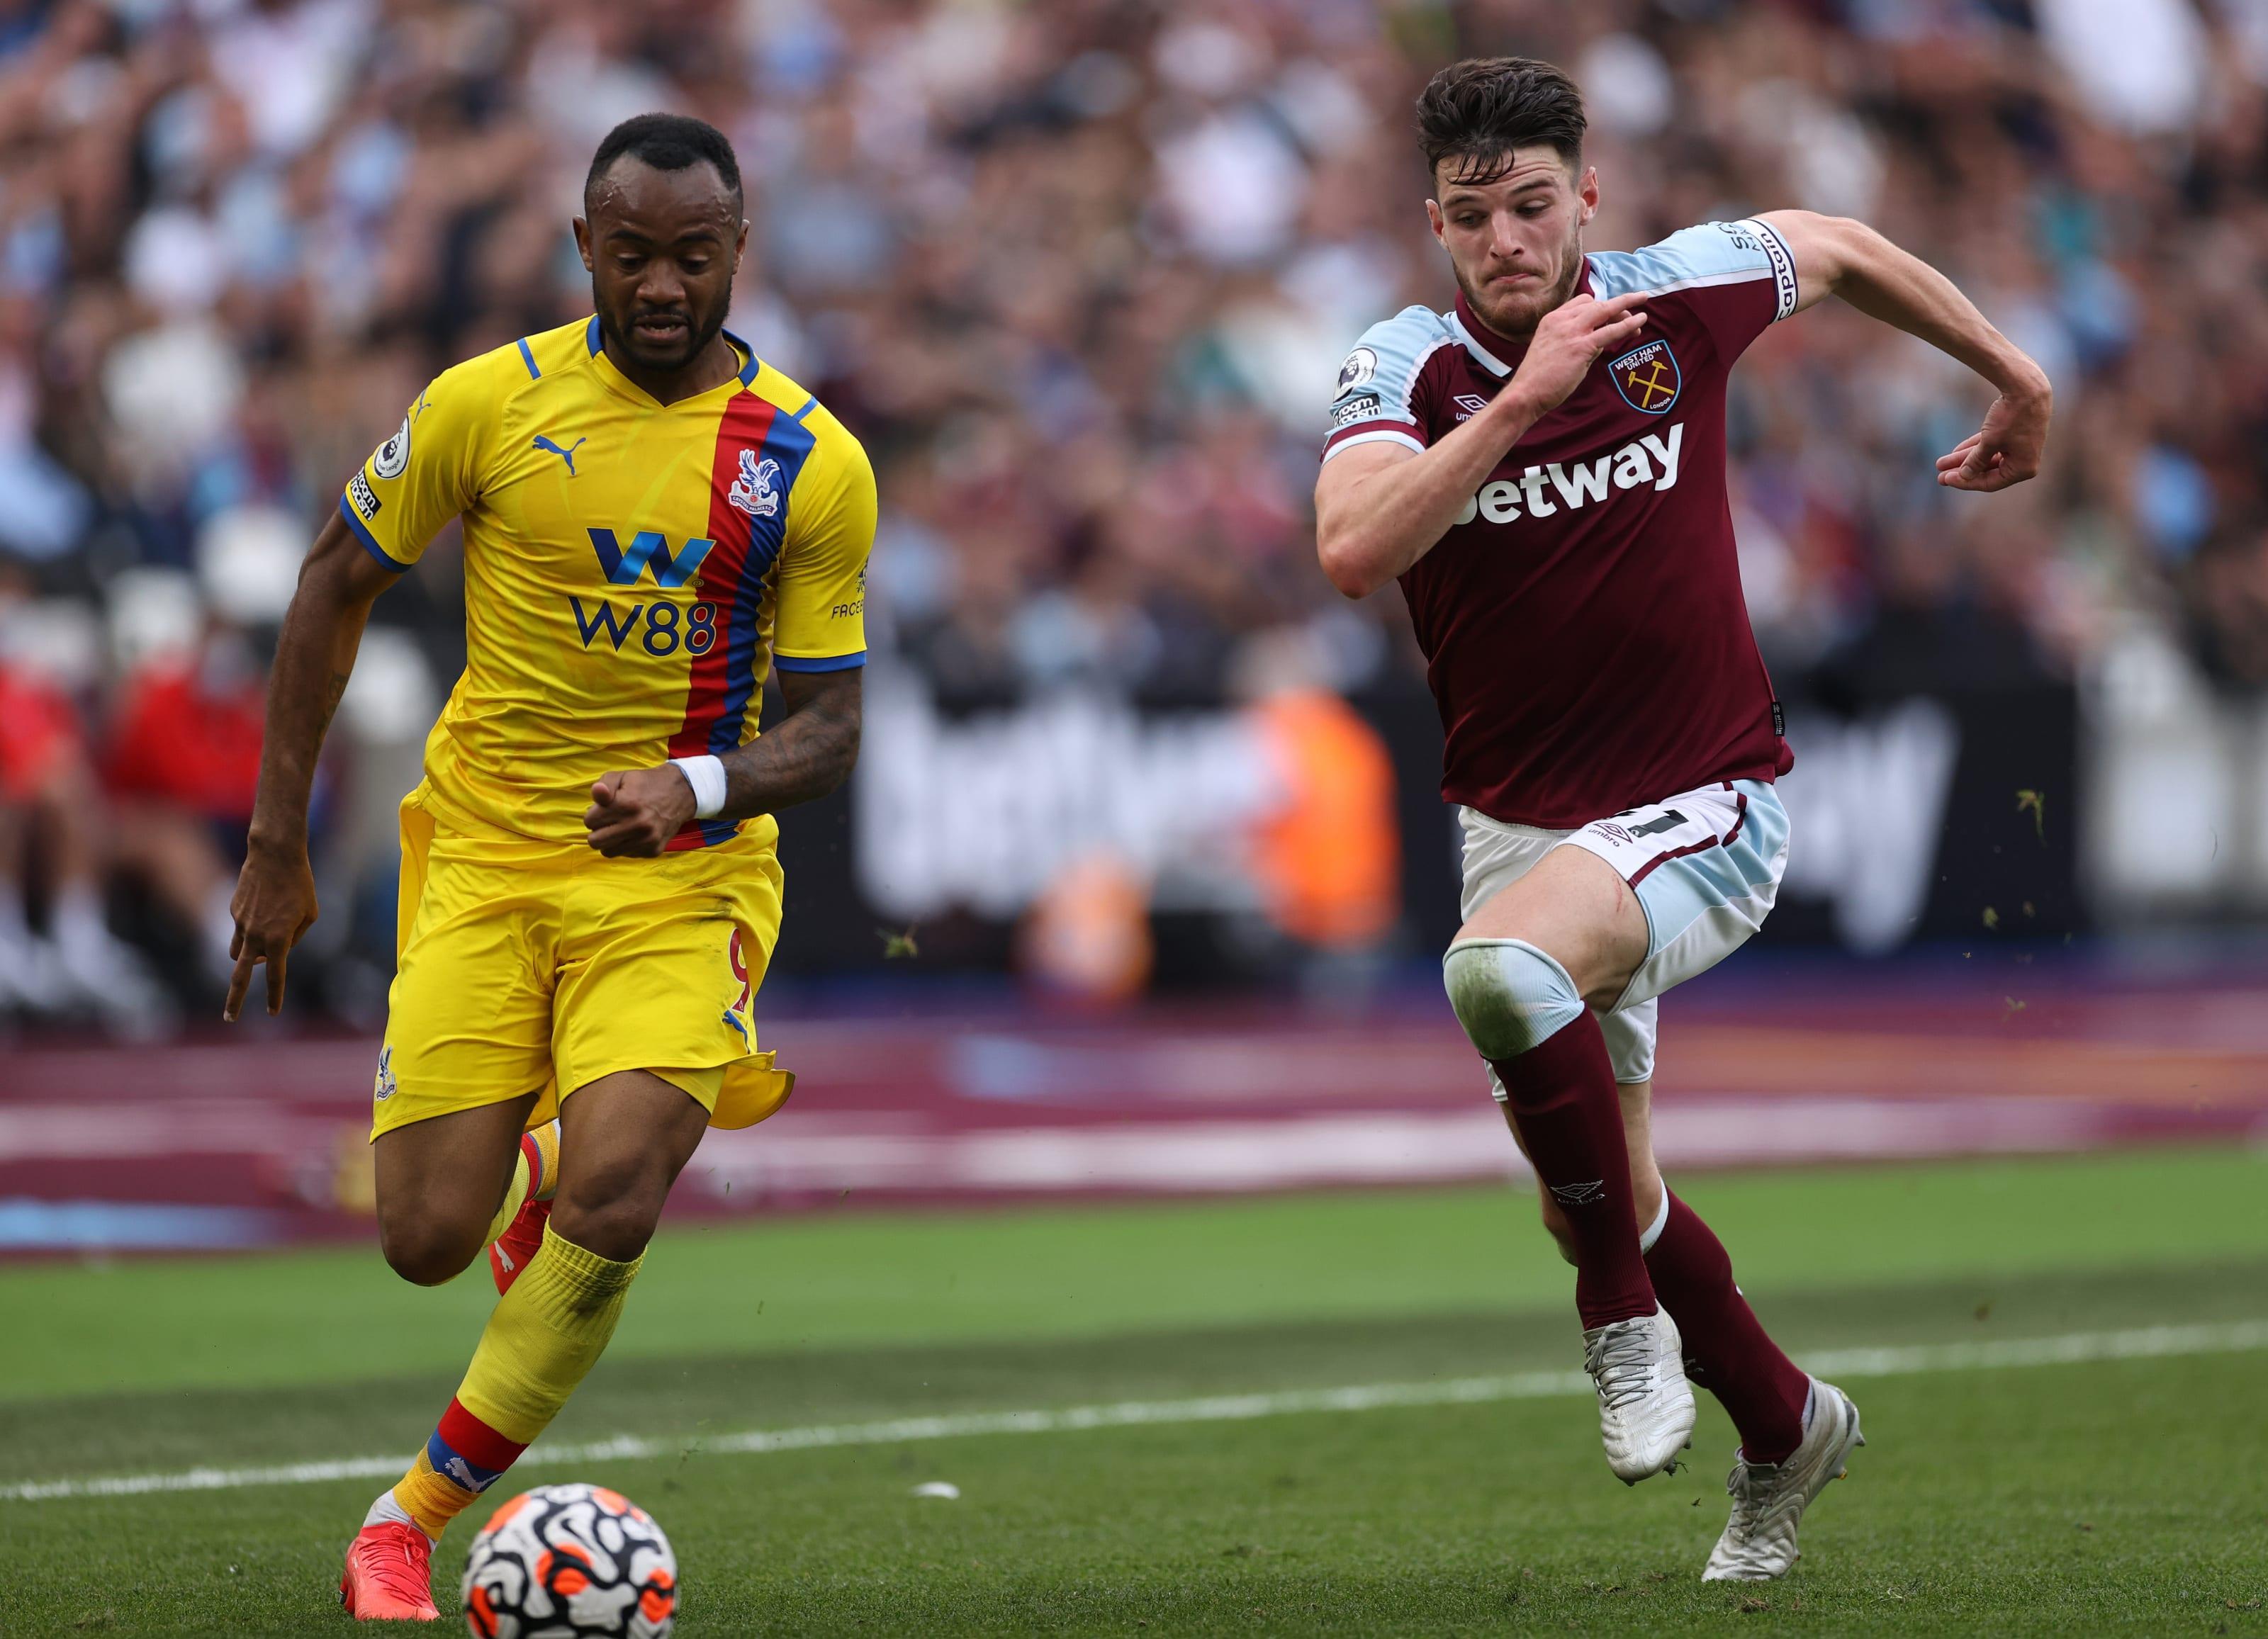 Jordan Ayew of Crystal Palace is chased by Declan Rice of West Ham. (Photo by Eddie Keogh/Getty Images)